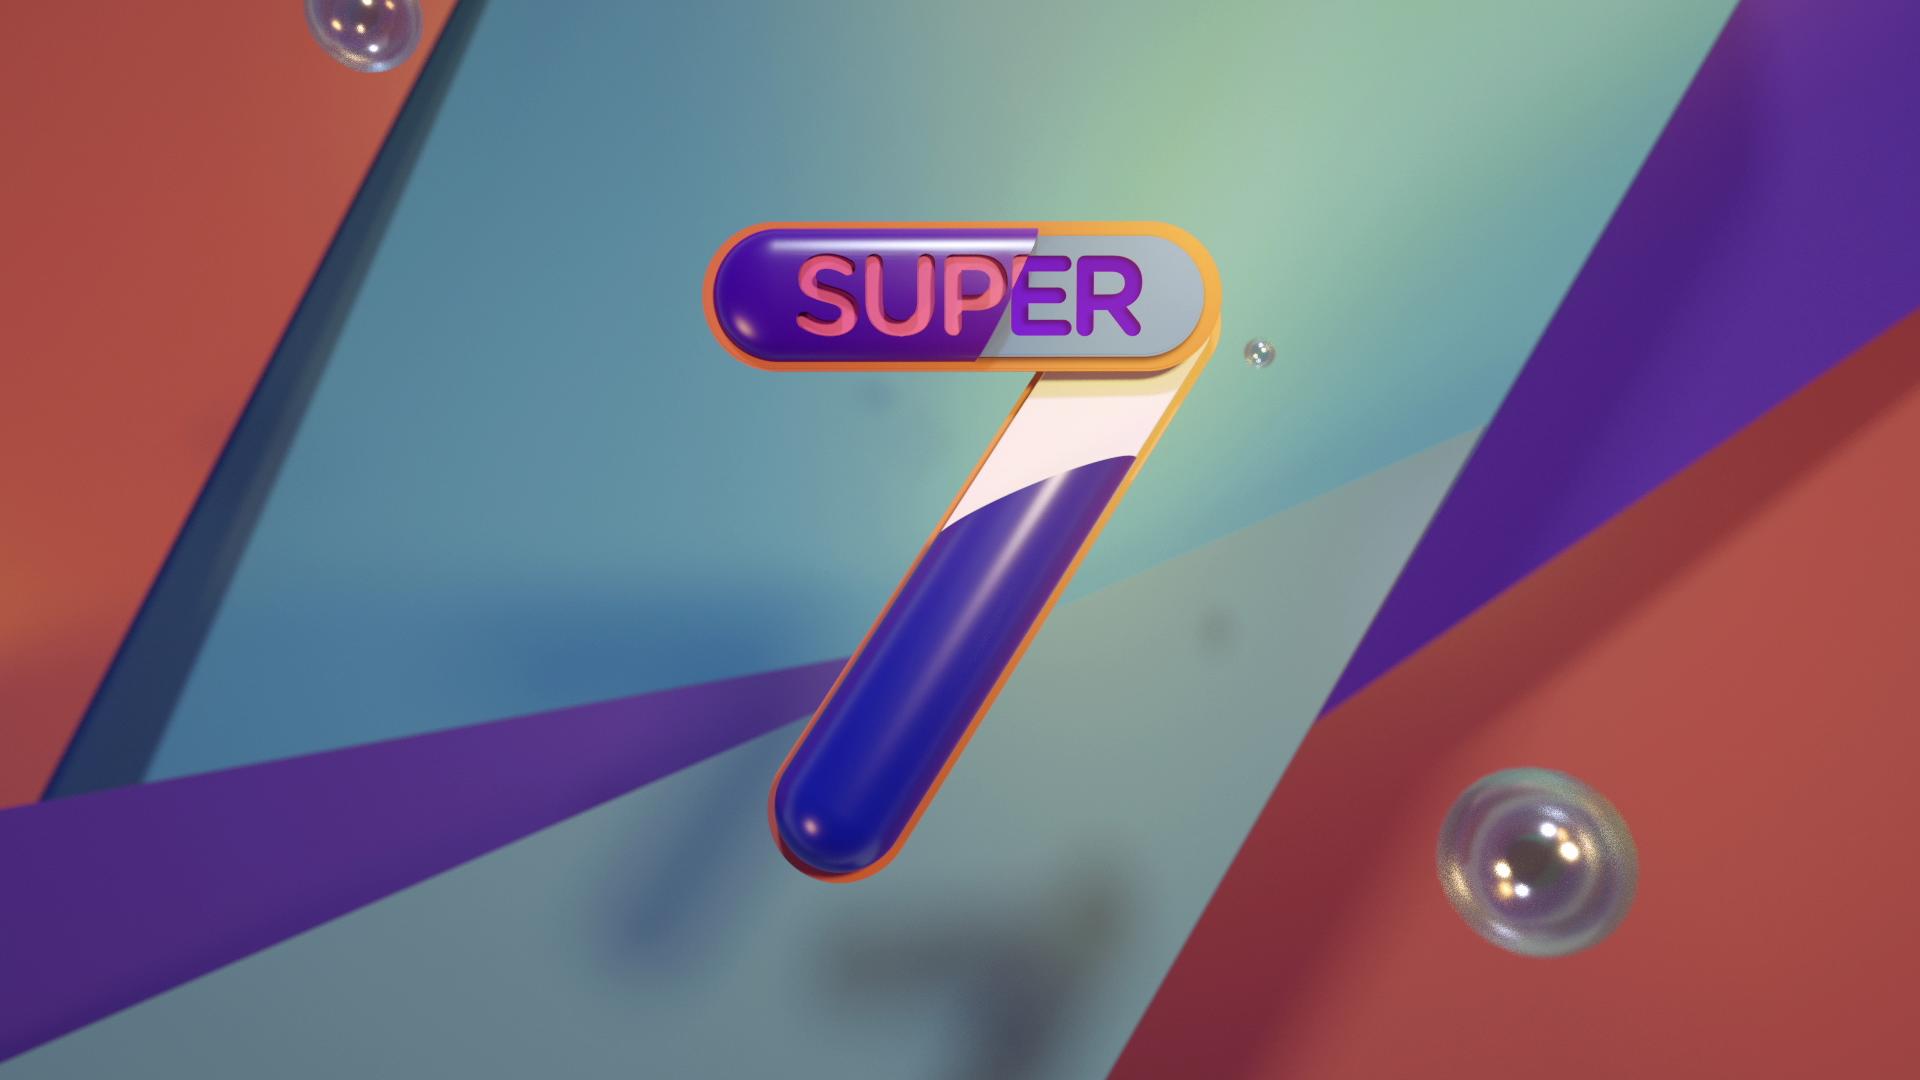 BRANDING — SUPER 7 - — DESIGN